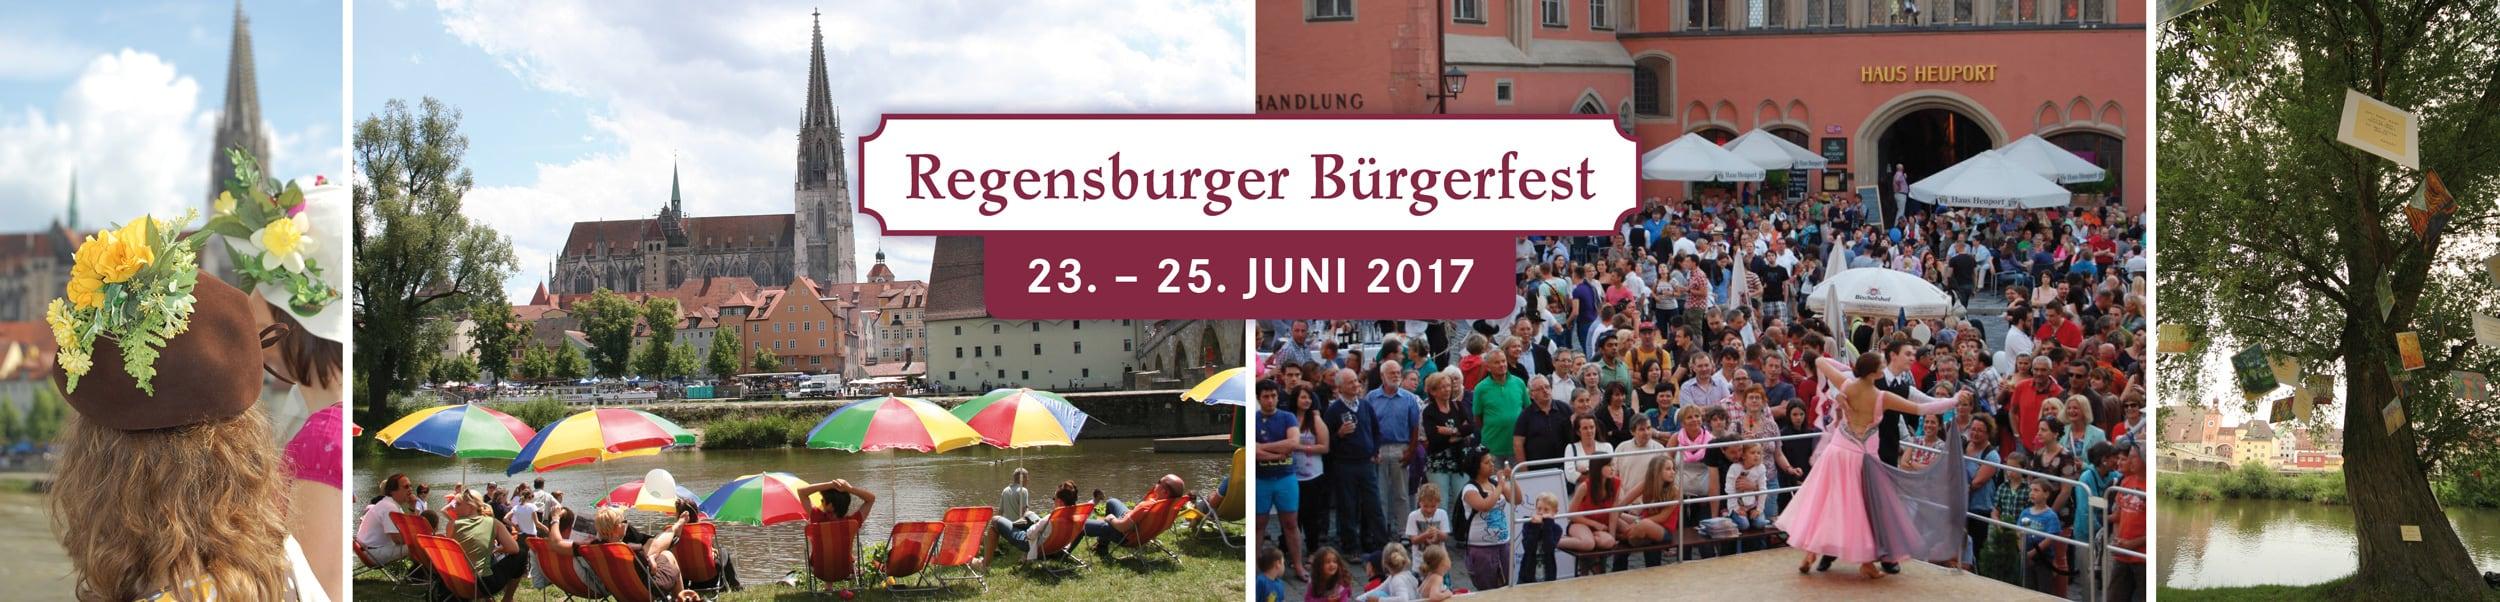 Buergerfest Regensburg